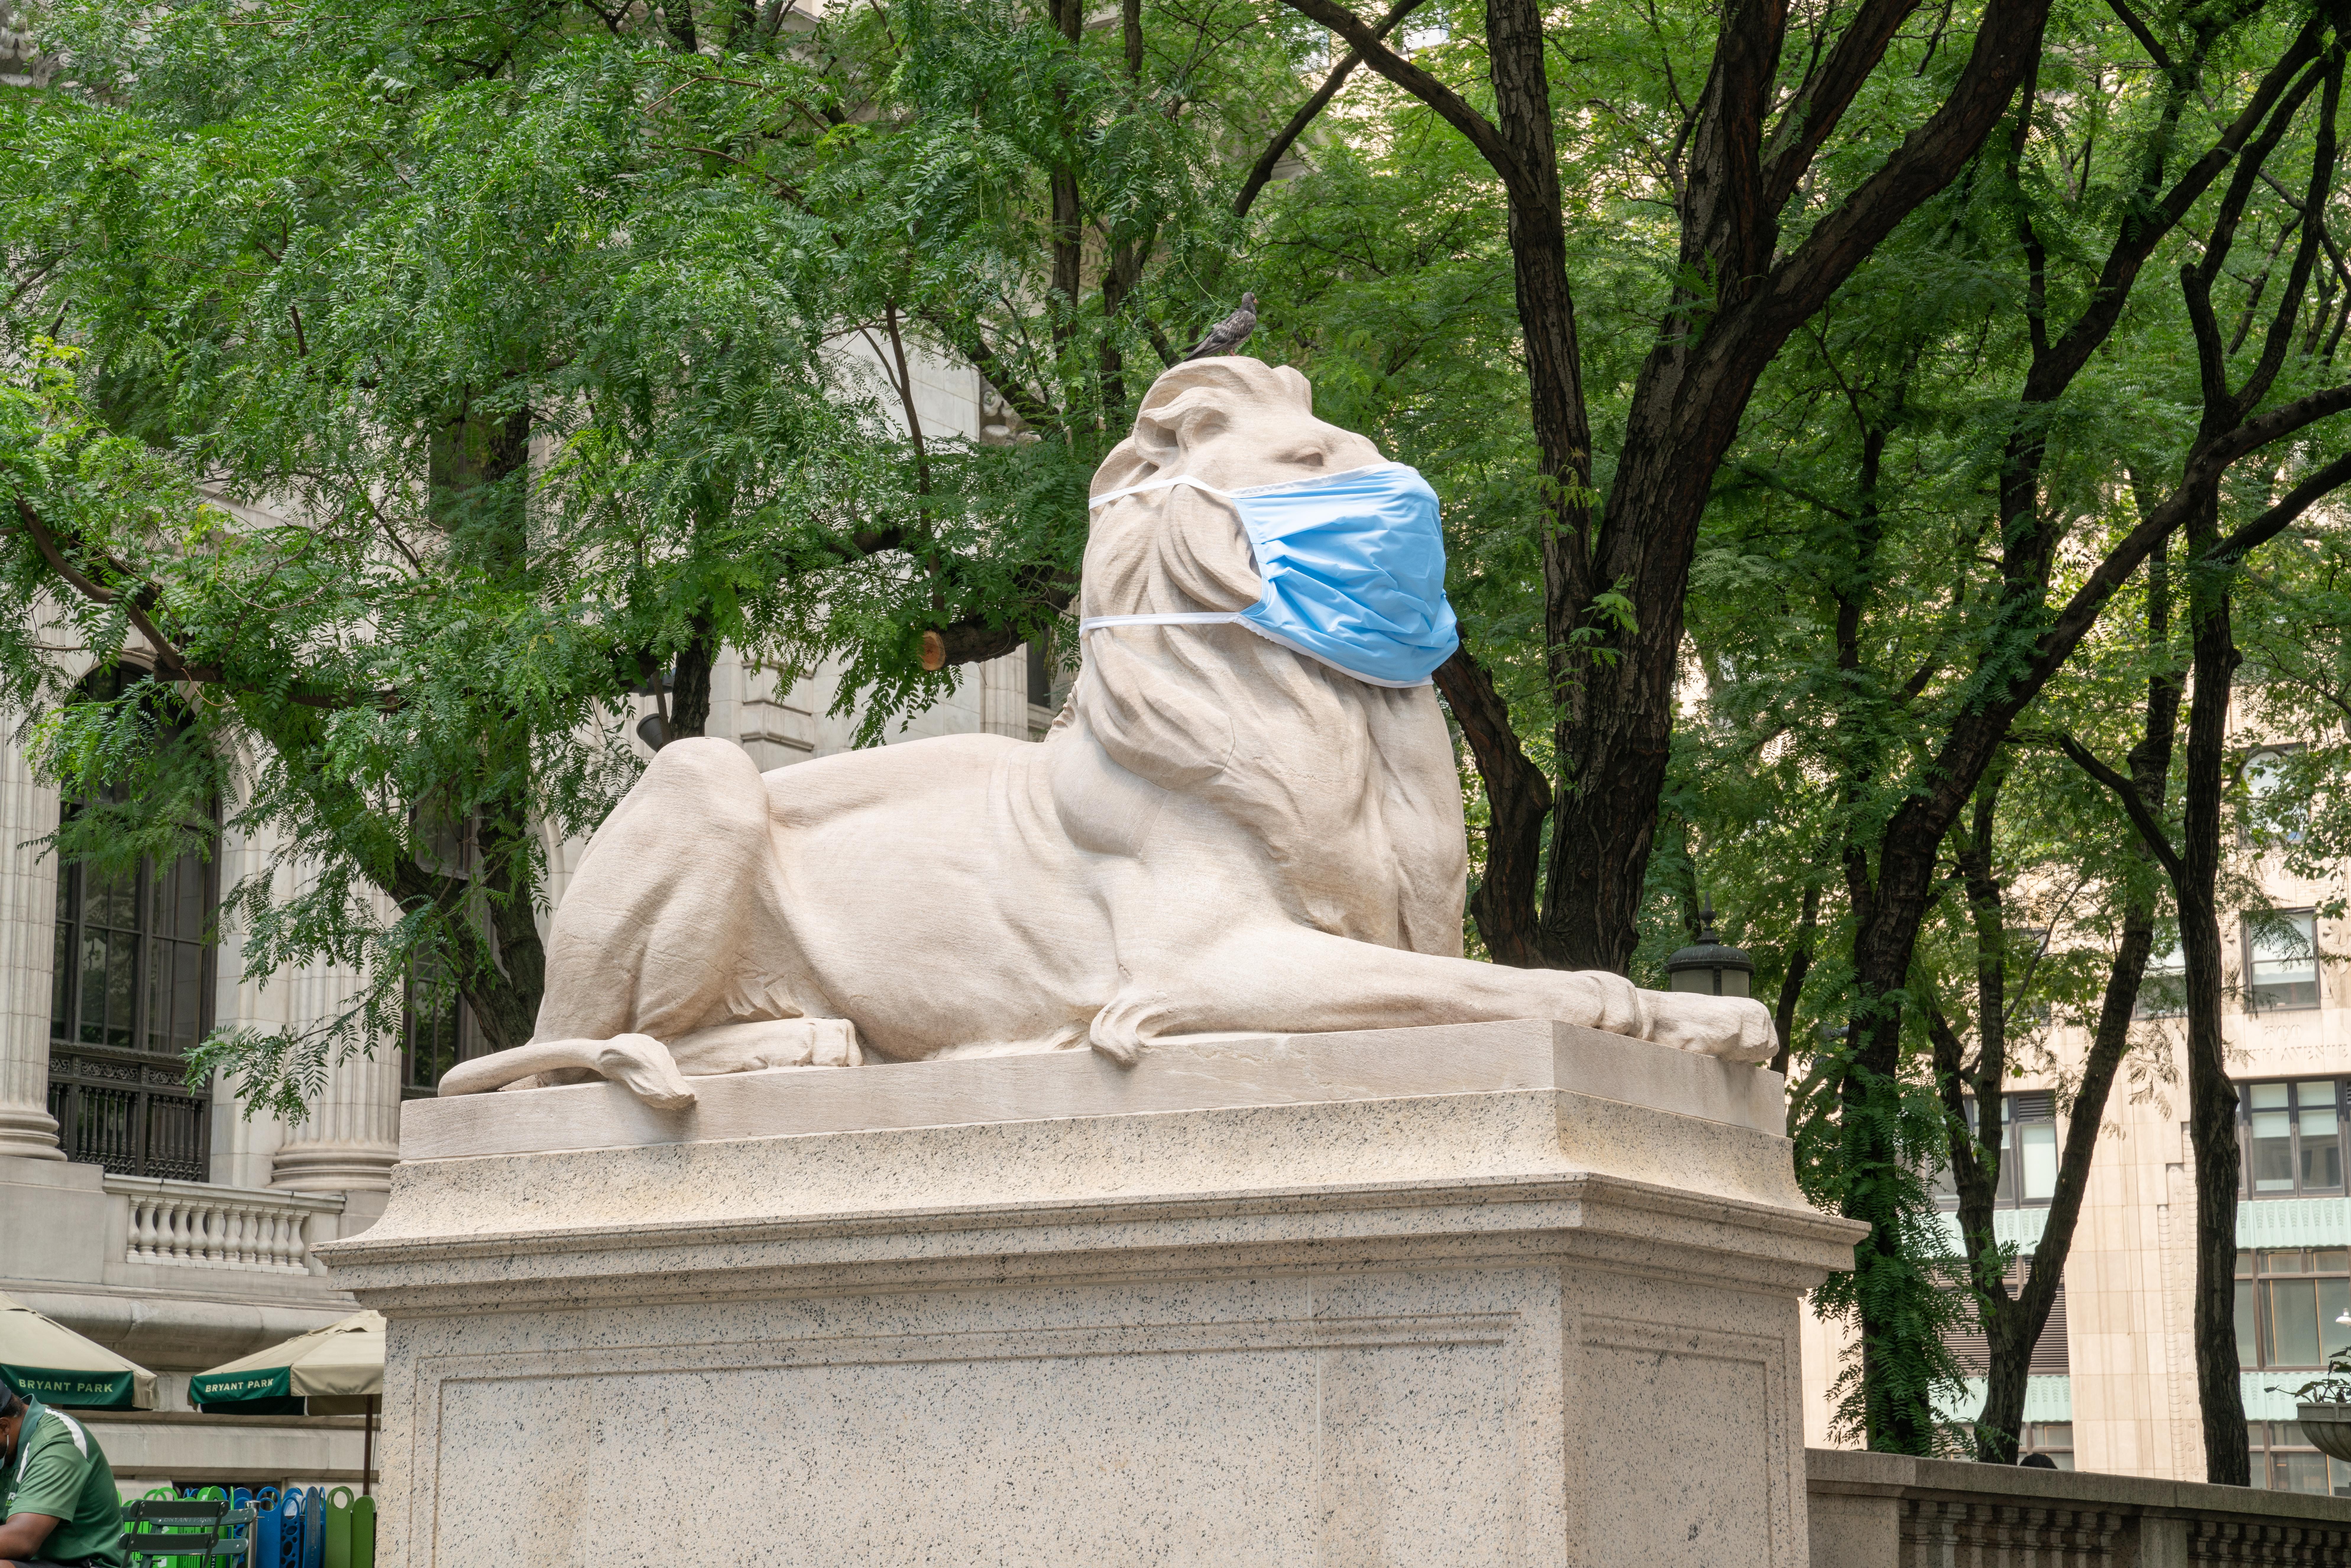 SASB_06_29_2020_Lions_mask-00194.jpg